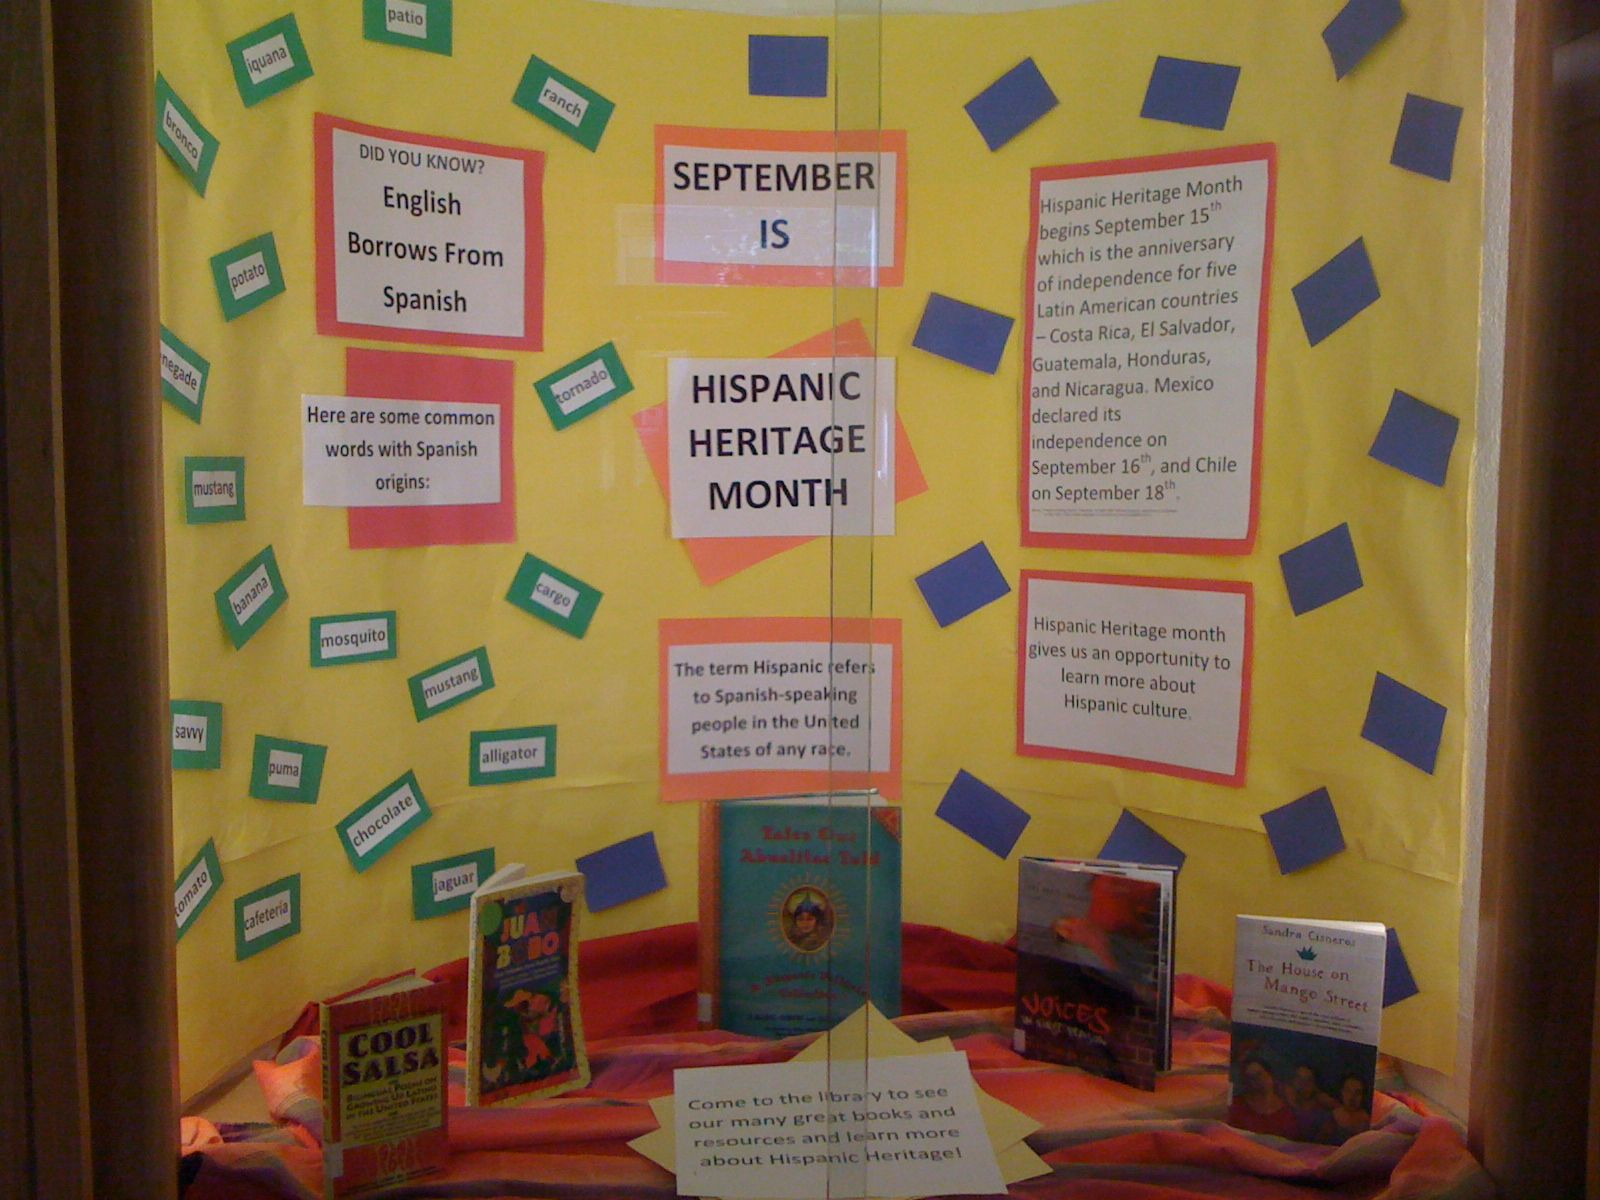 School Library Bulletin Board Ideas An Art Teacher S Bulletin Board Each Grad September Bulletin Boards School Library Bulletin Boards Hispanic History Month